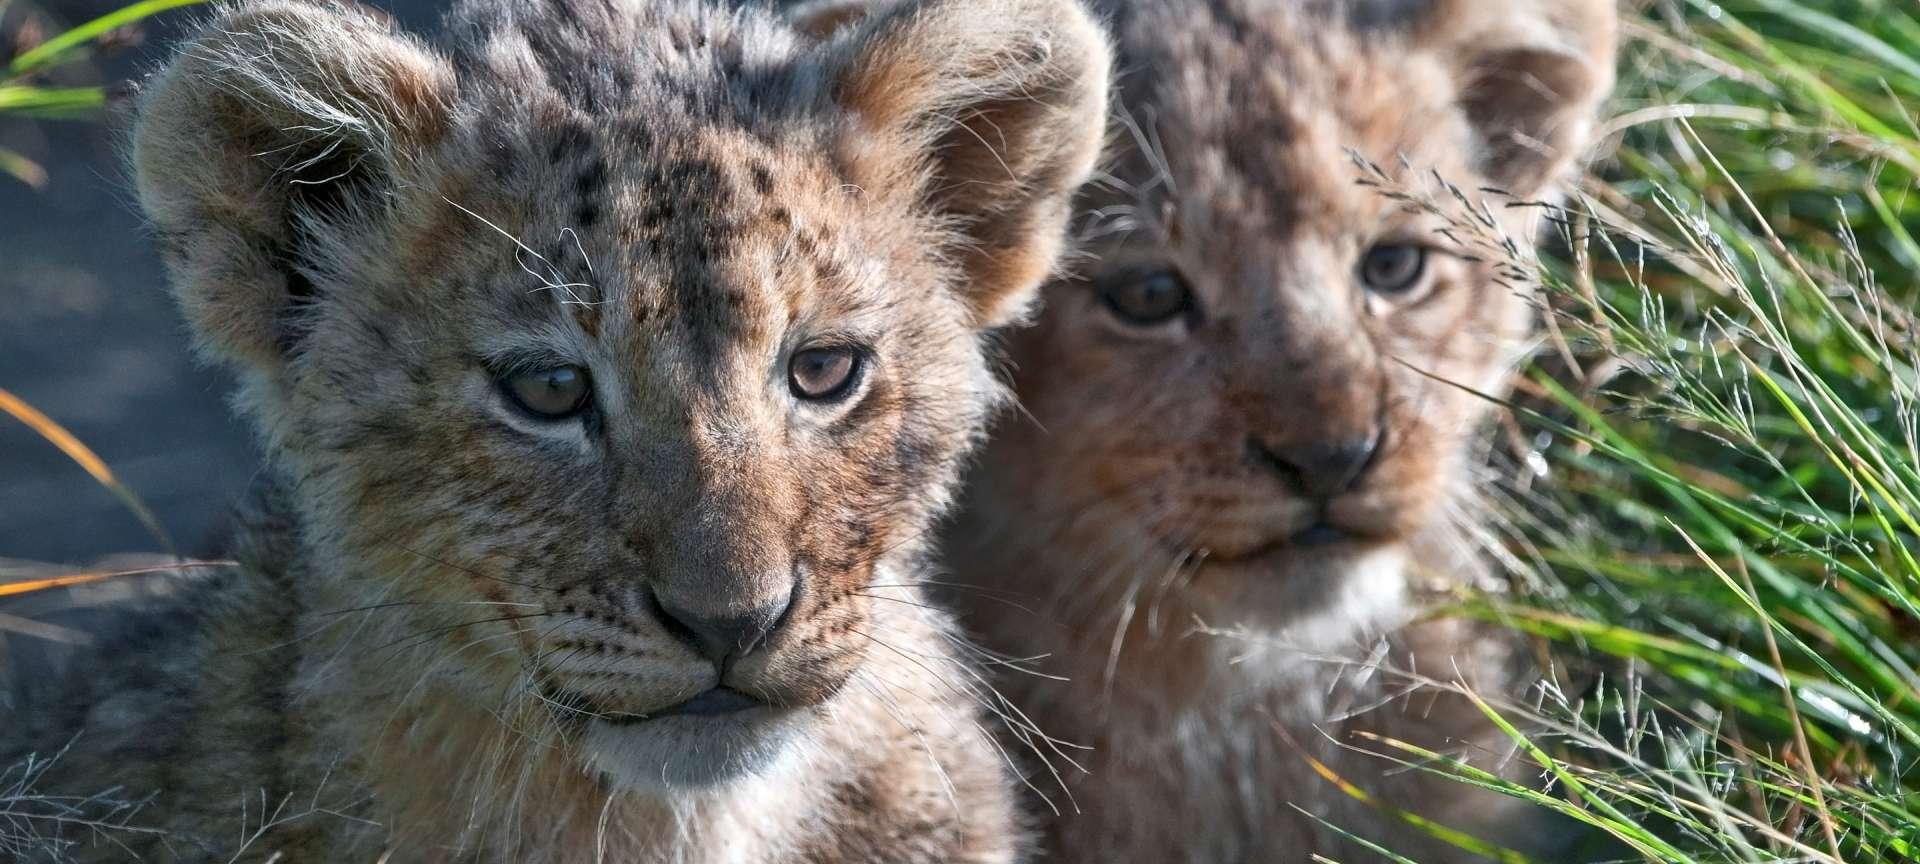 Selous Game Reserve - Africa Wildlife Safaris